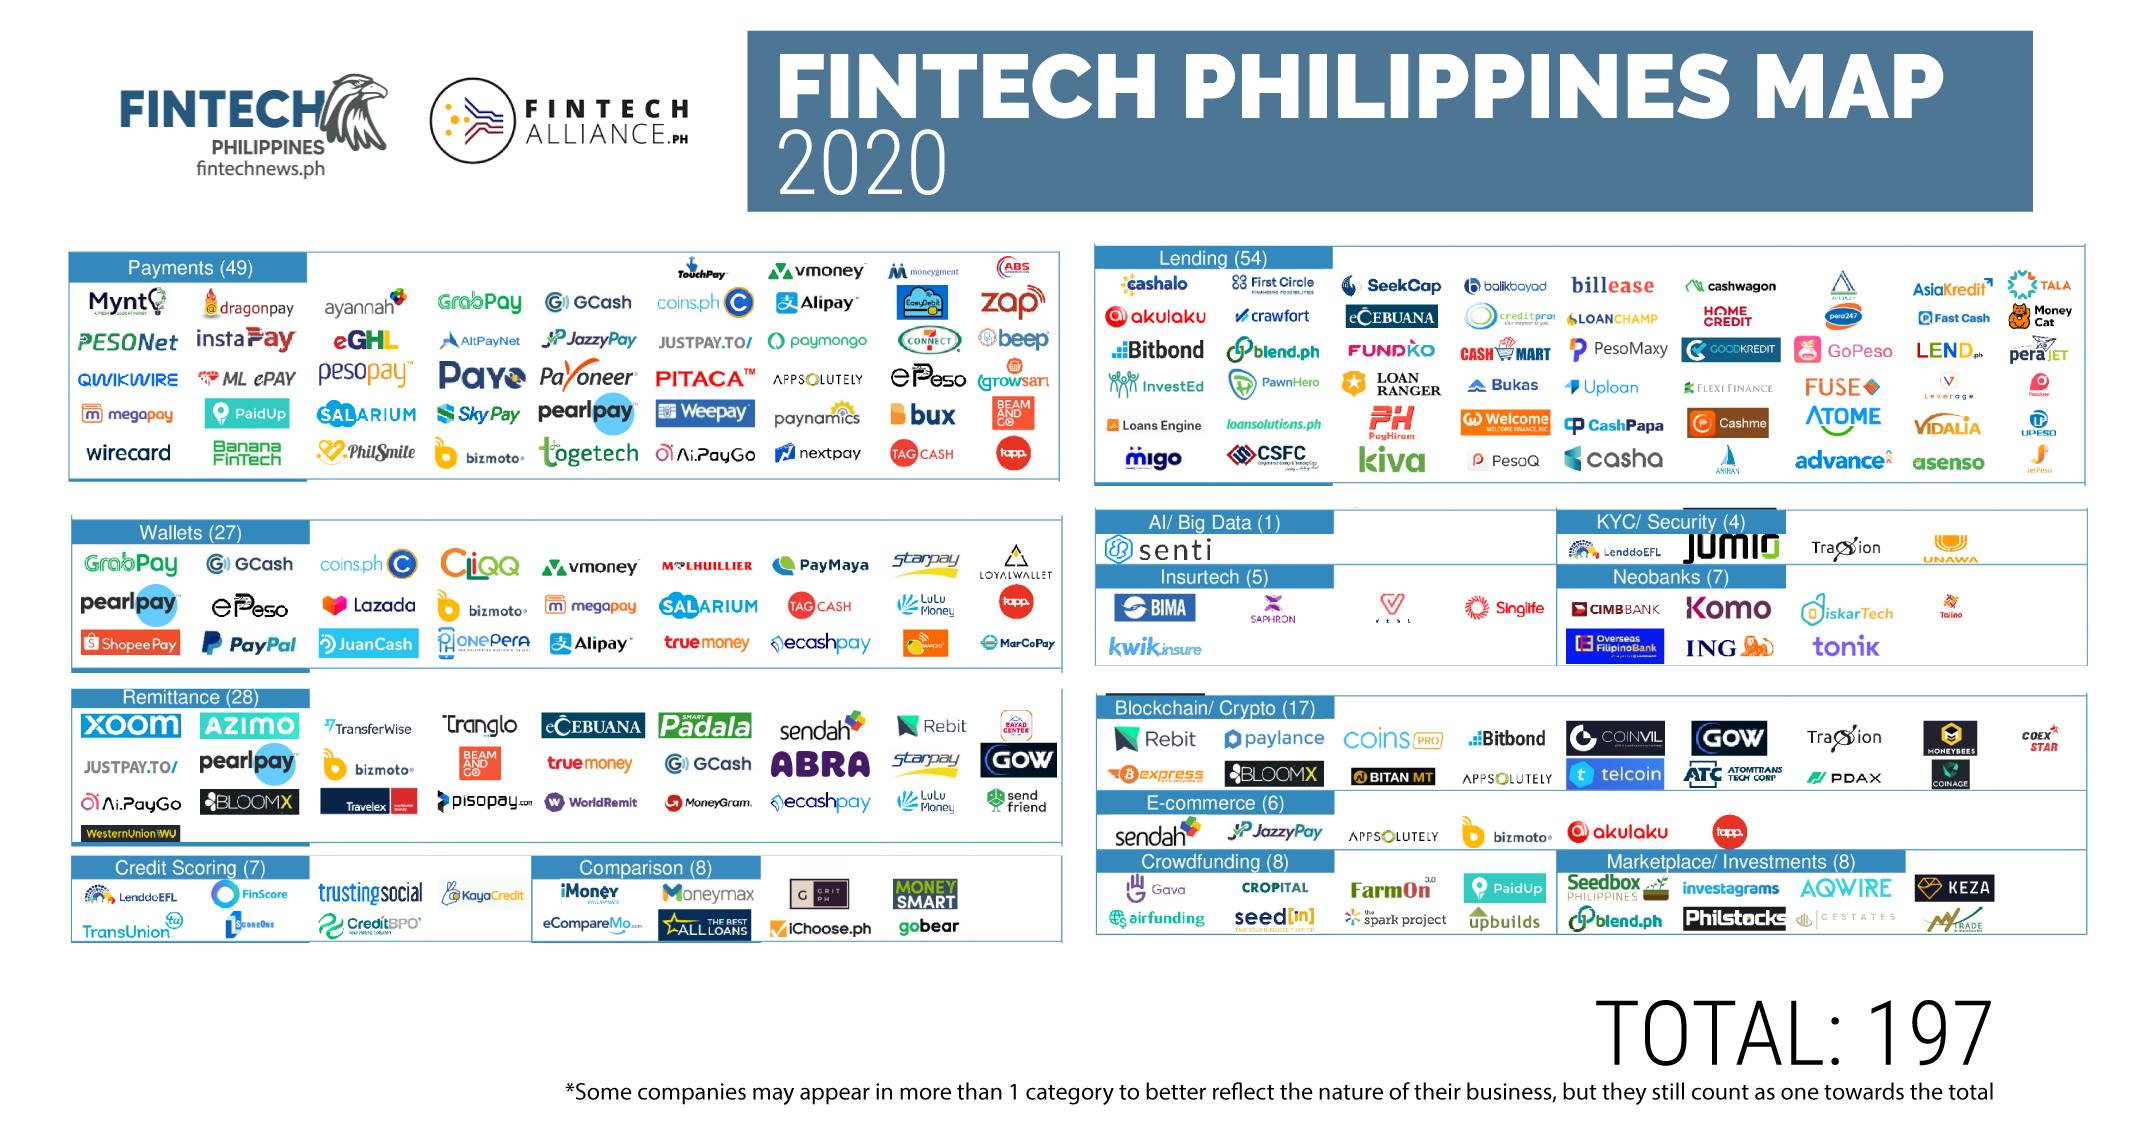 Philippines Fintech Report 2020